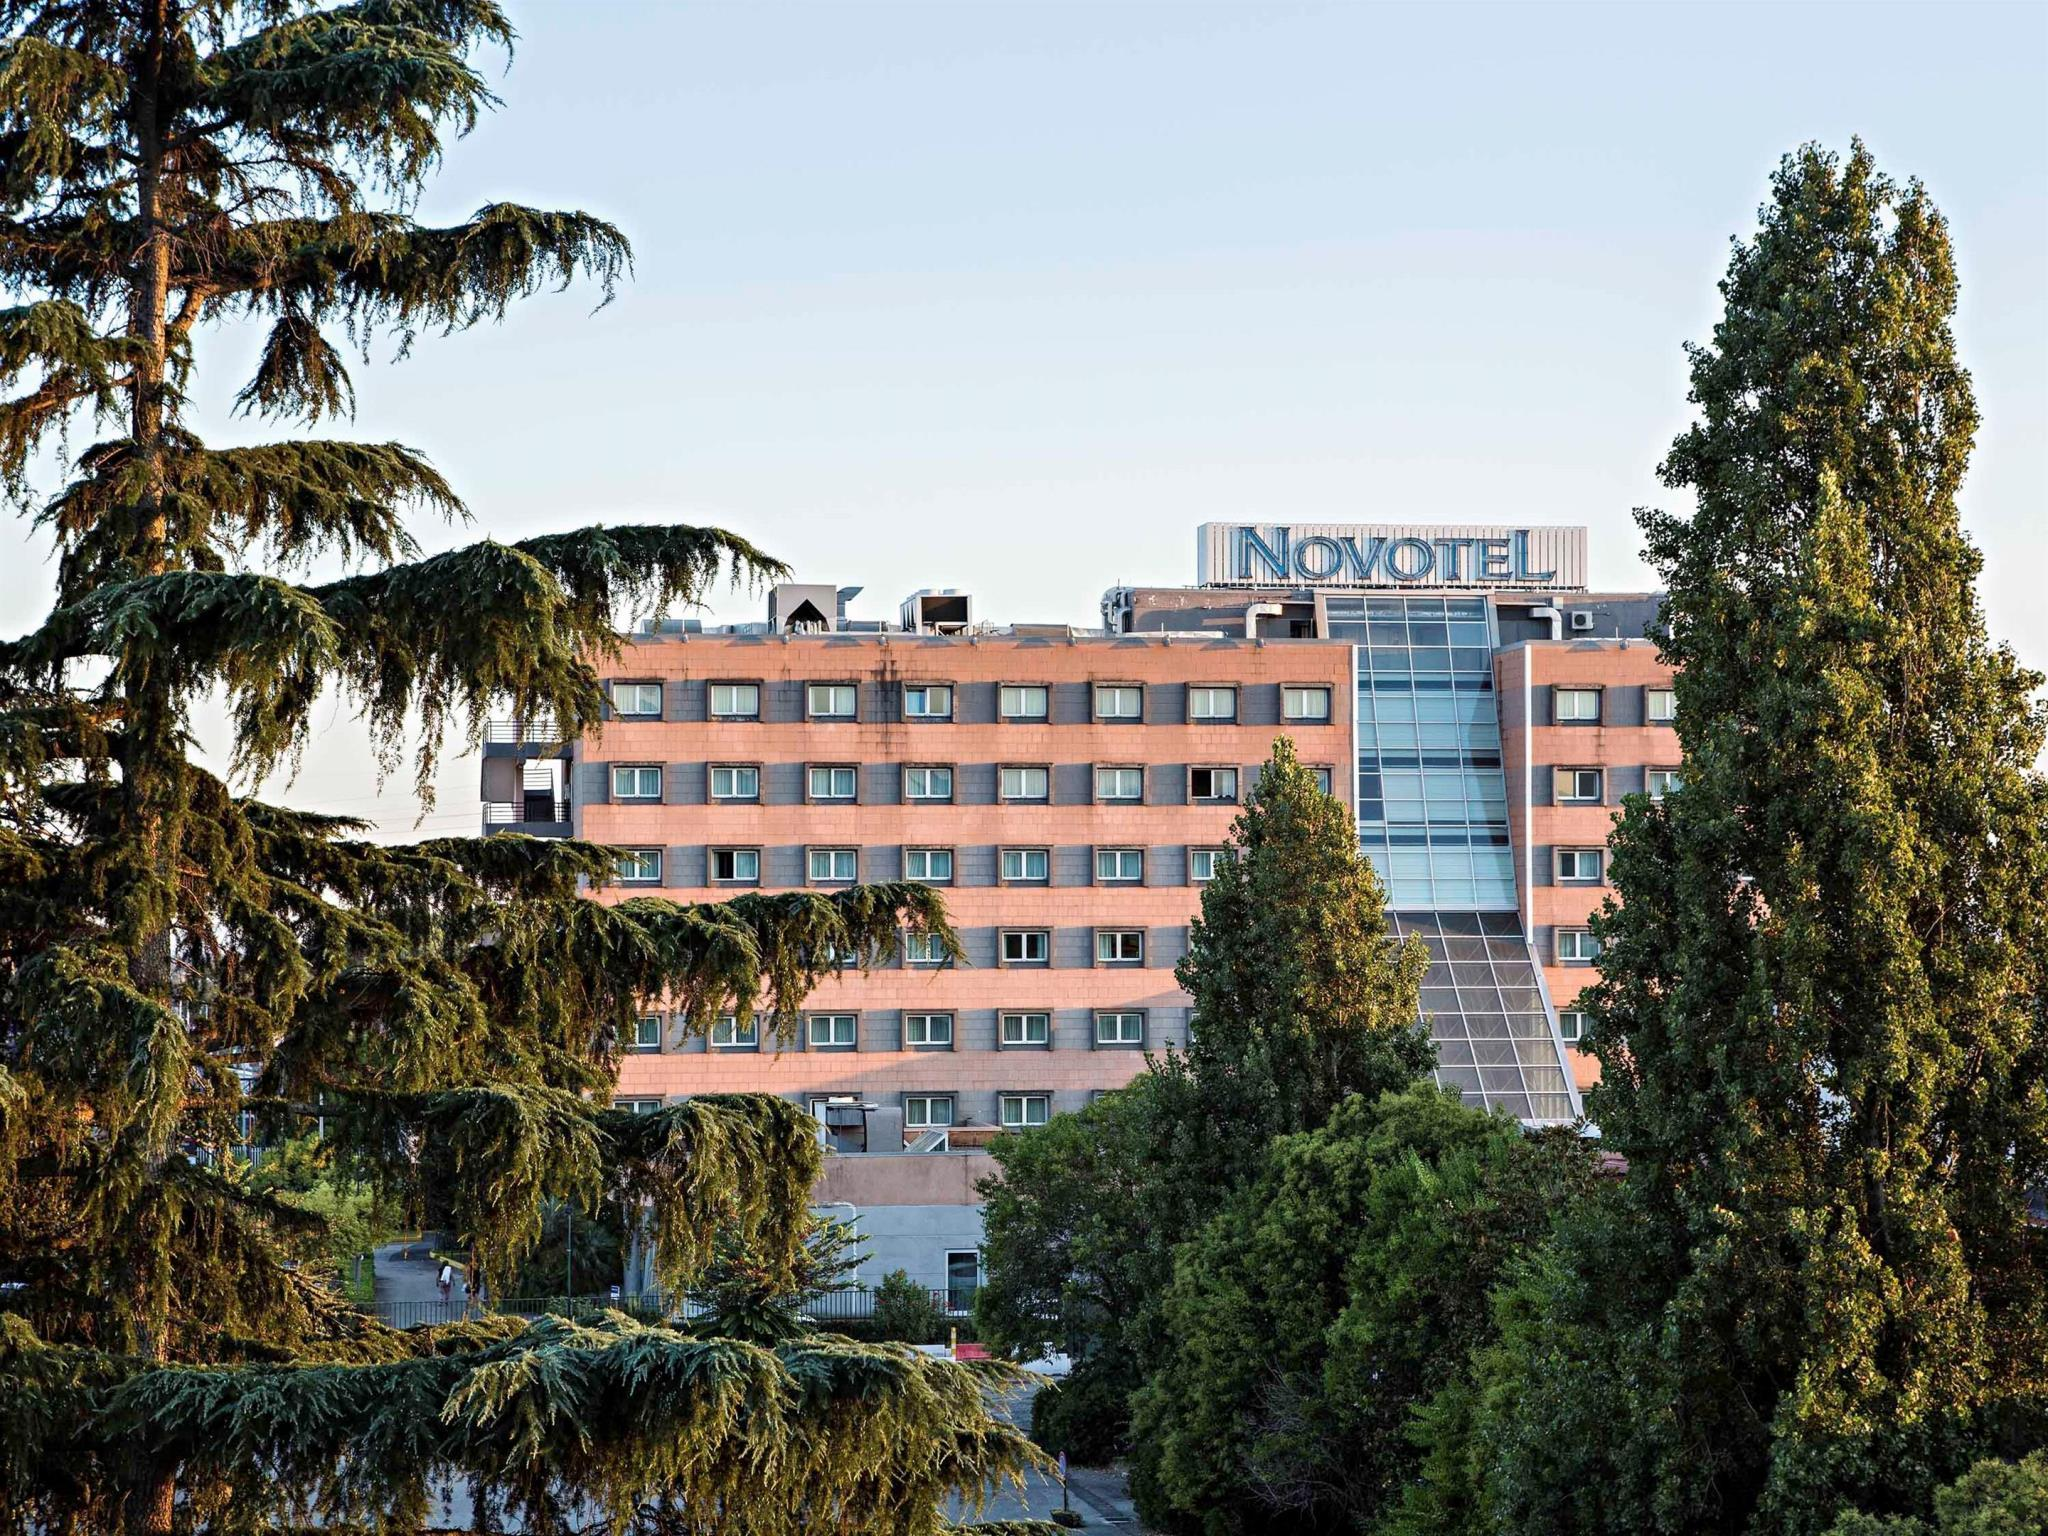 Novotel Caserta Sud Hotel